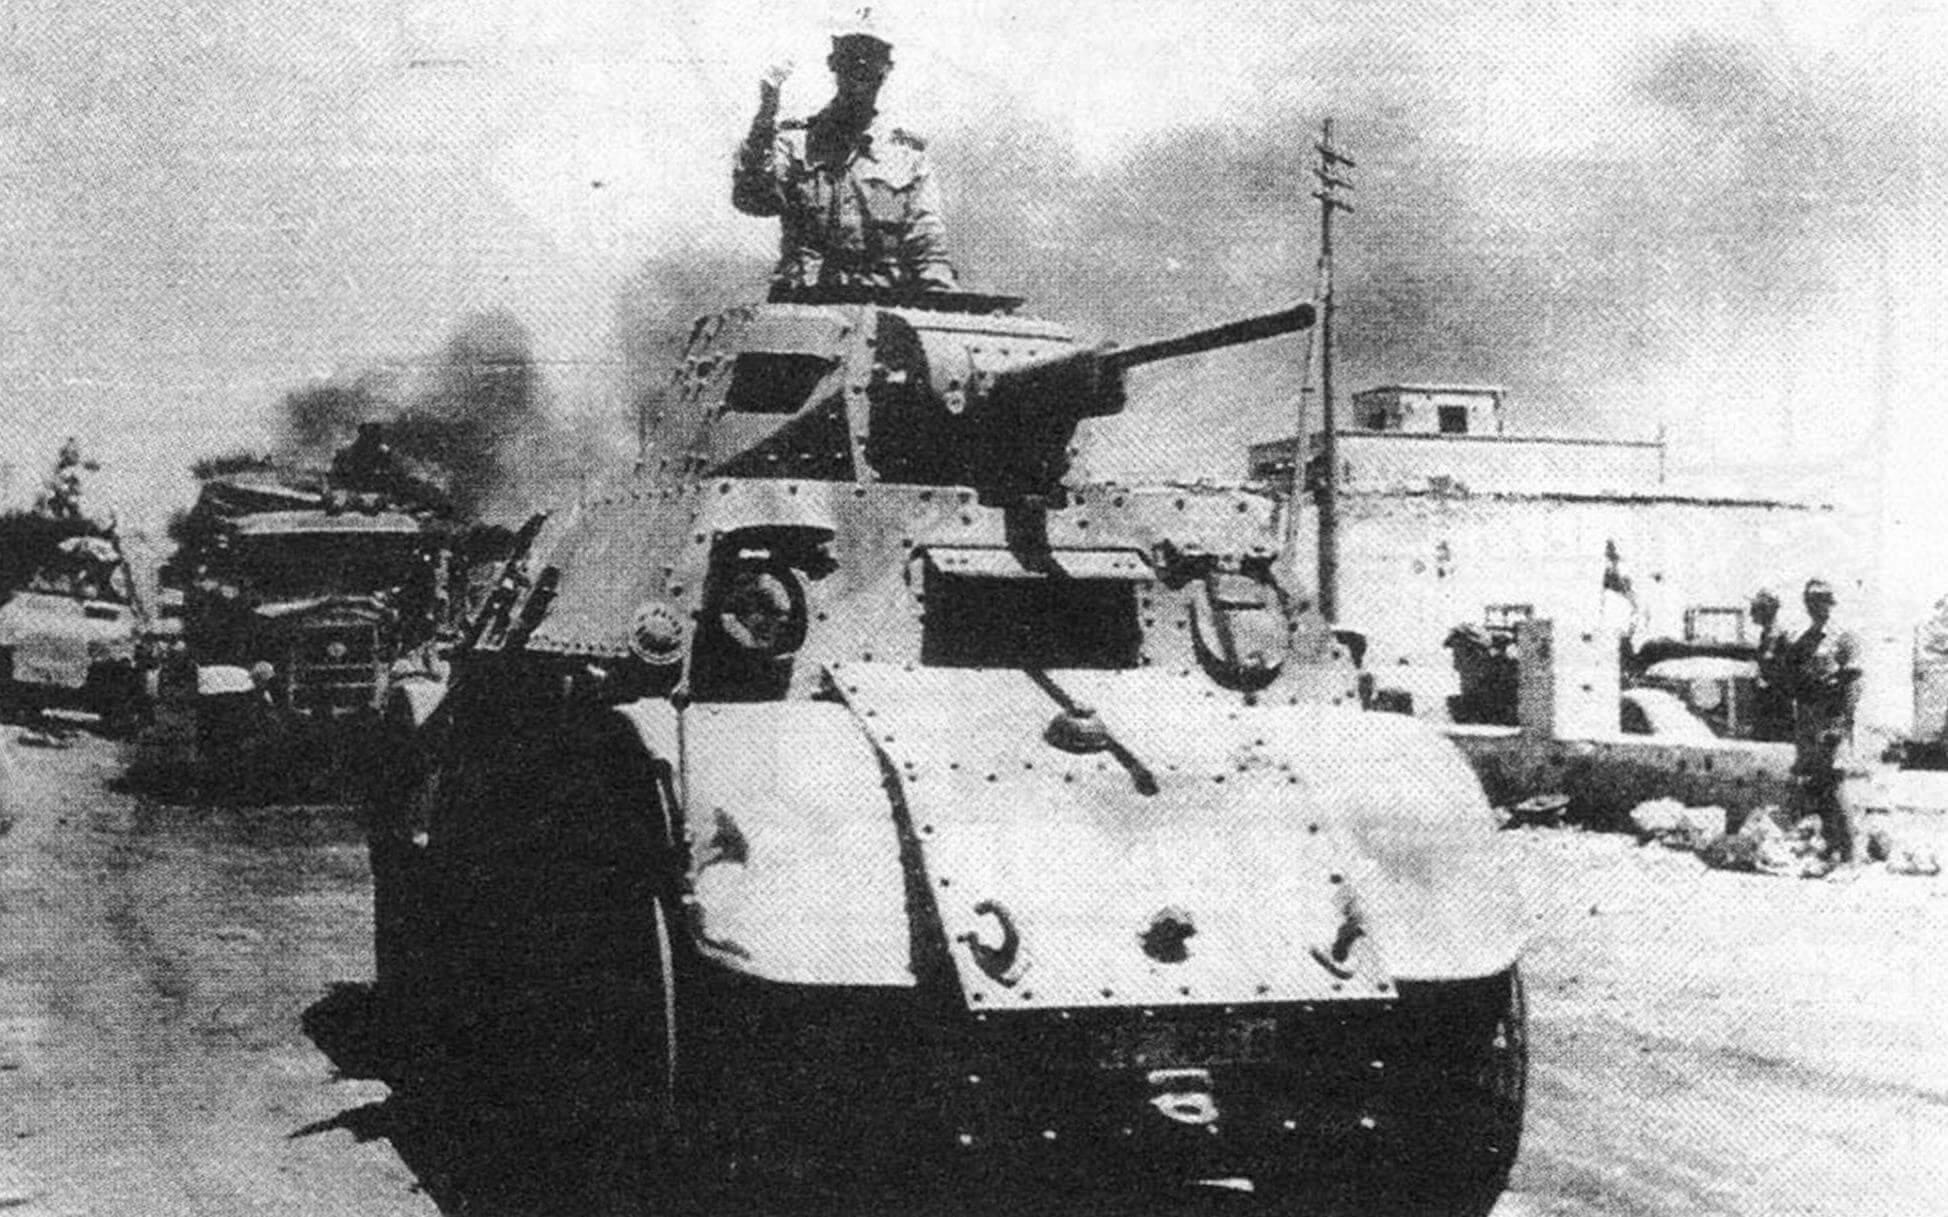 Колонна бронеавтомобилей АВ 41 на марше. Северная Африка, 1942 г.